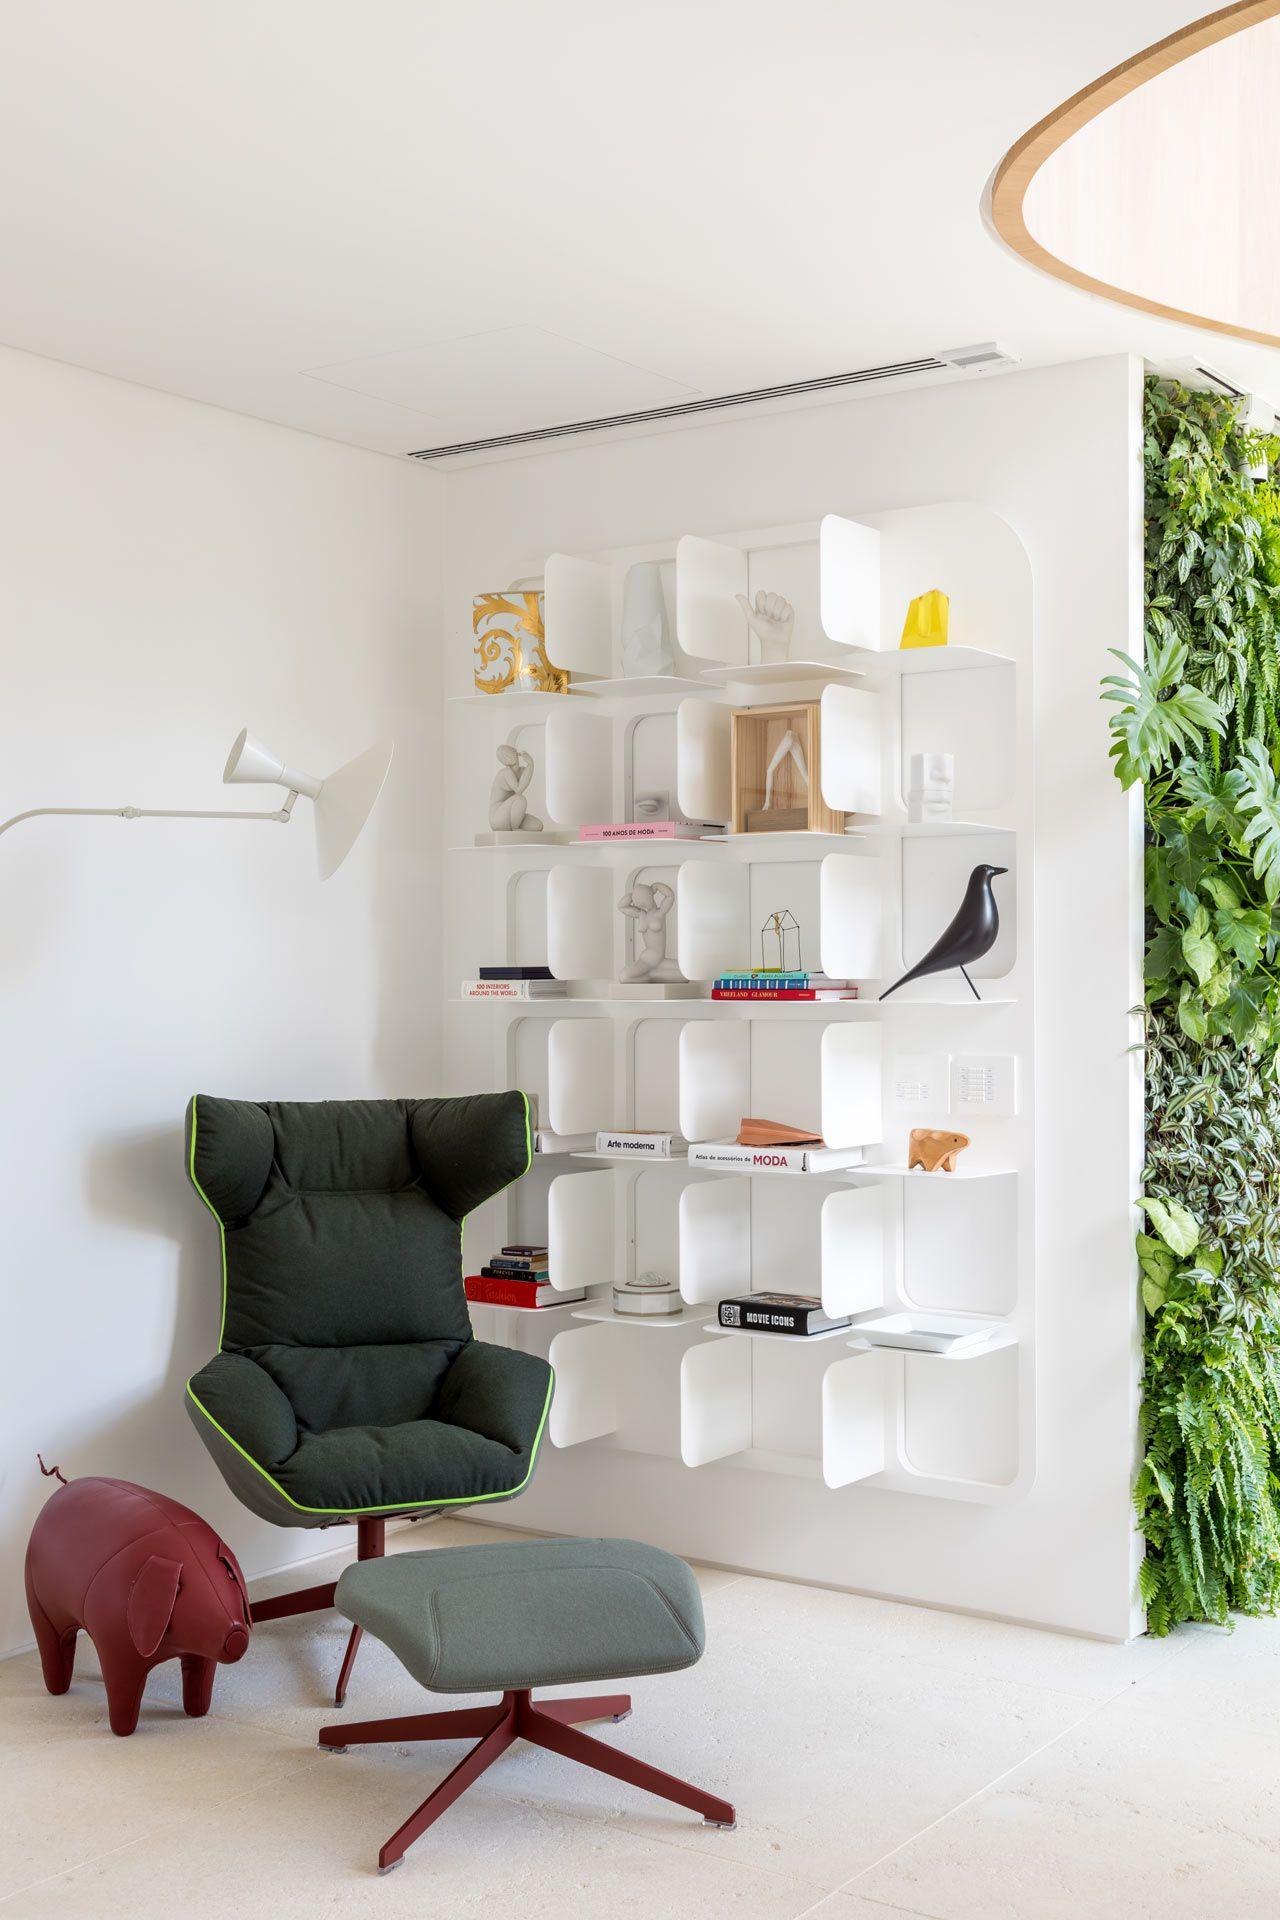 Tria arquitetura revitalize a 90s apartment in são paulo brazil design milk